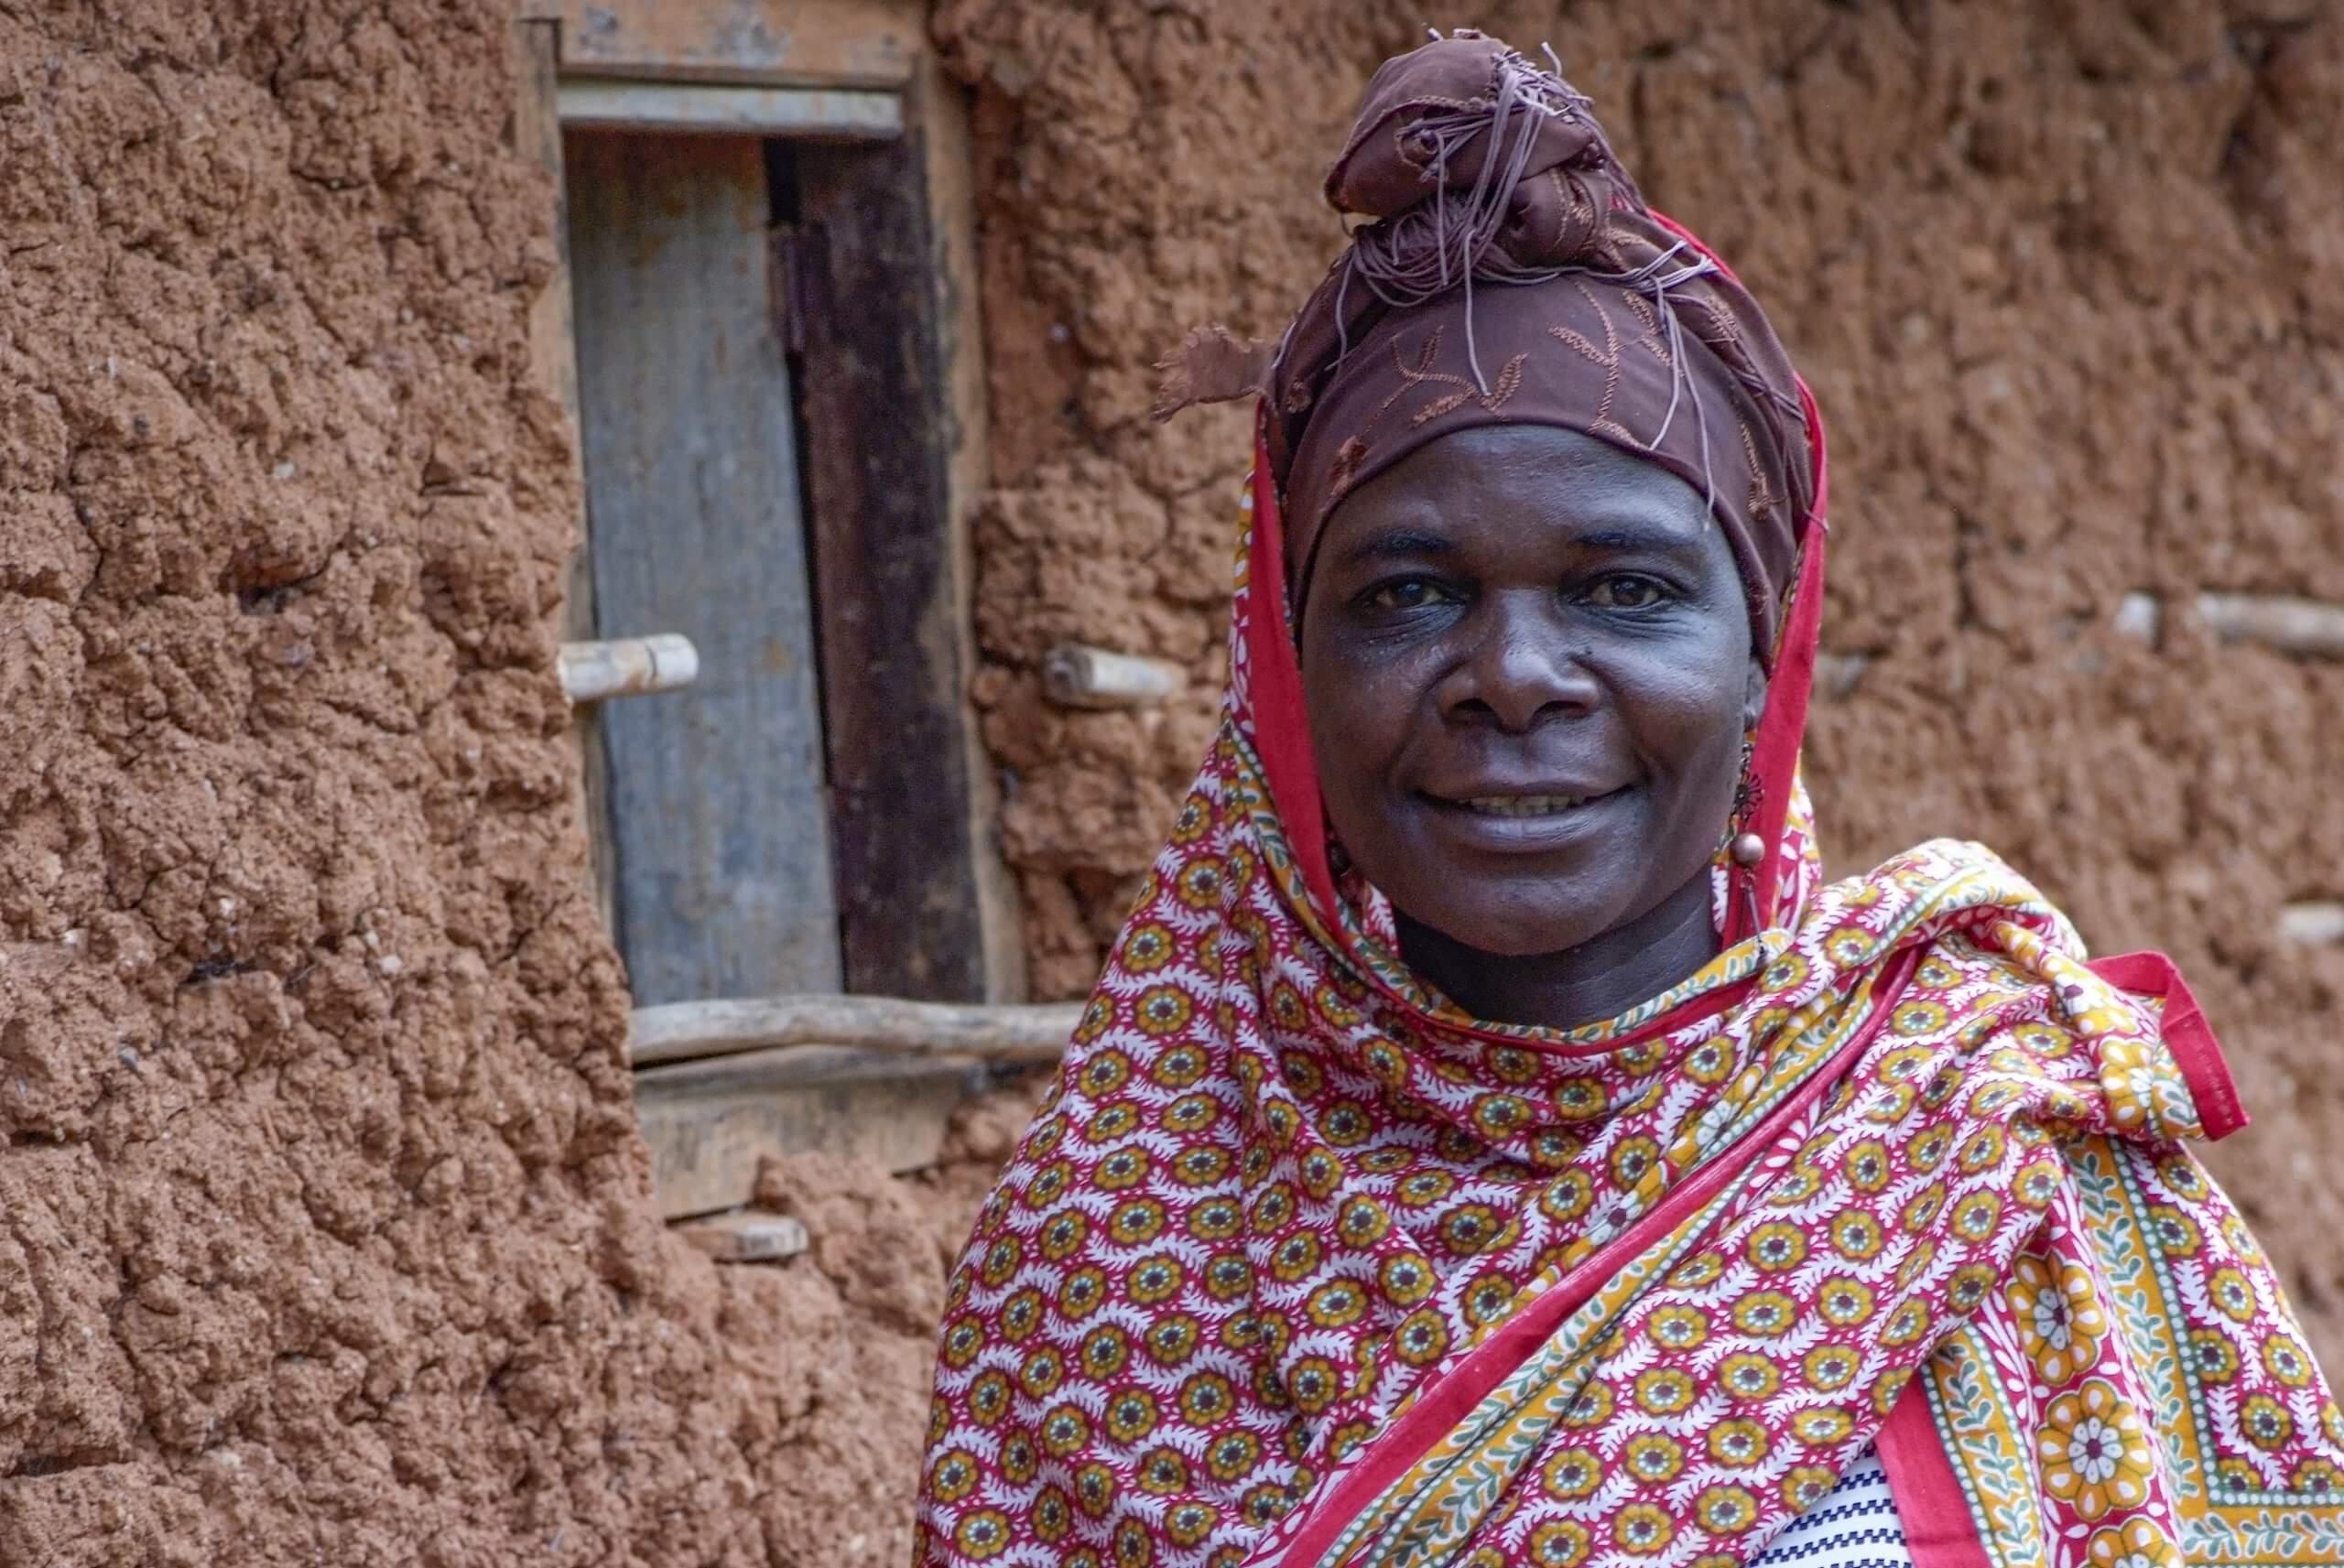 19 01 boerin trotse vrouw Zuhura Shabani Amani Tanzania 4647 scaled